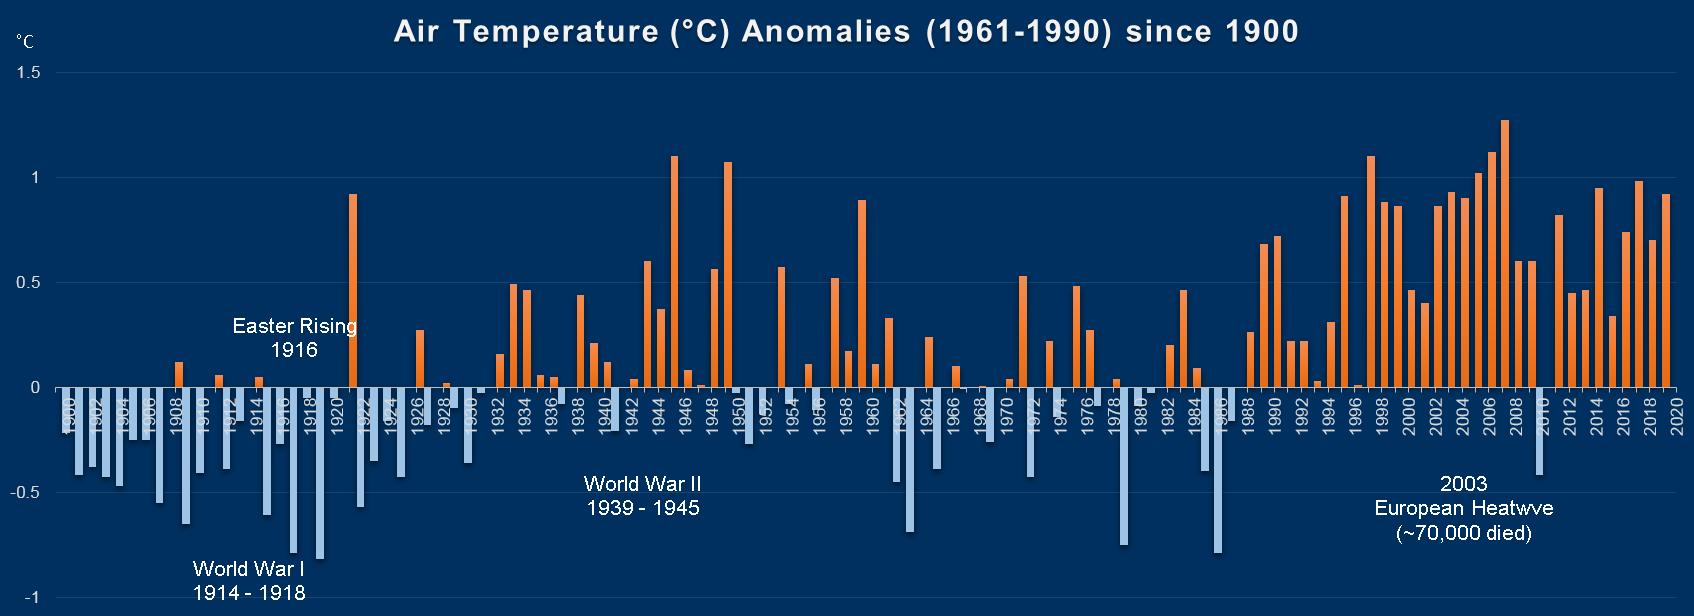 Temperature - Met Éireann - The Irish Meteorological Service